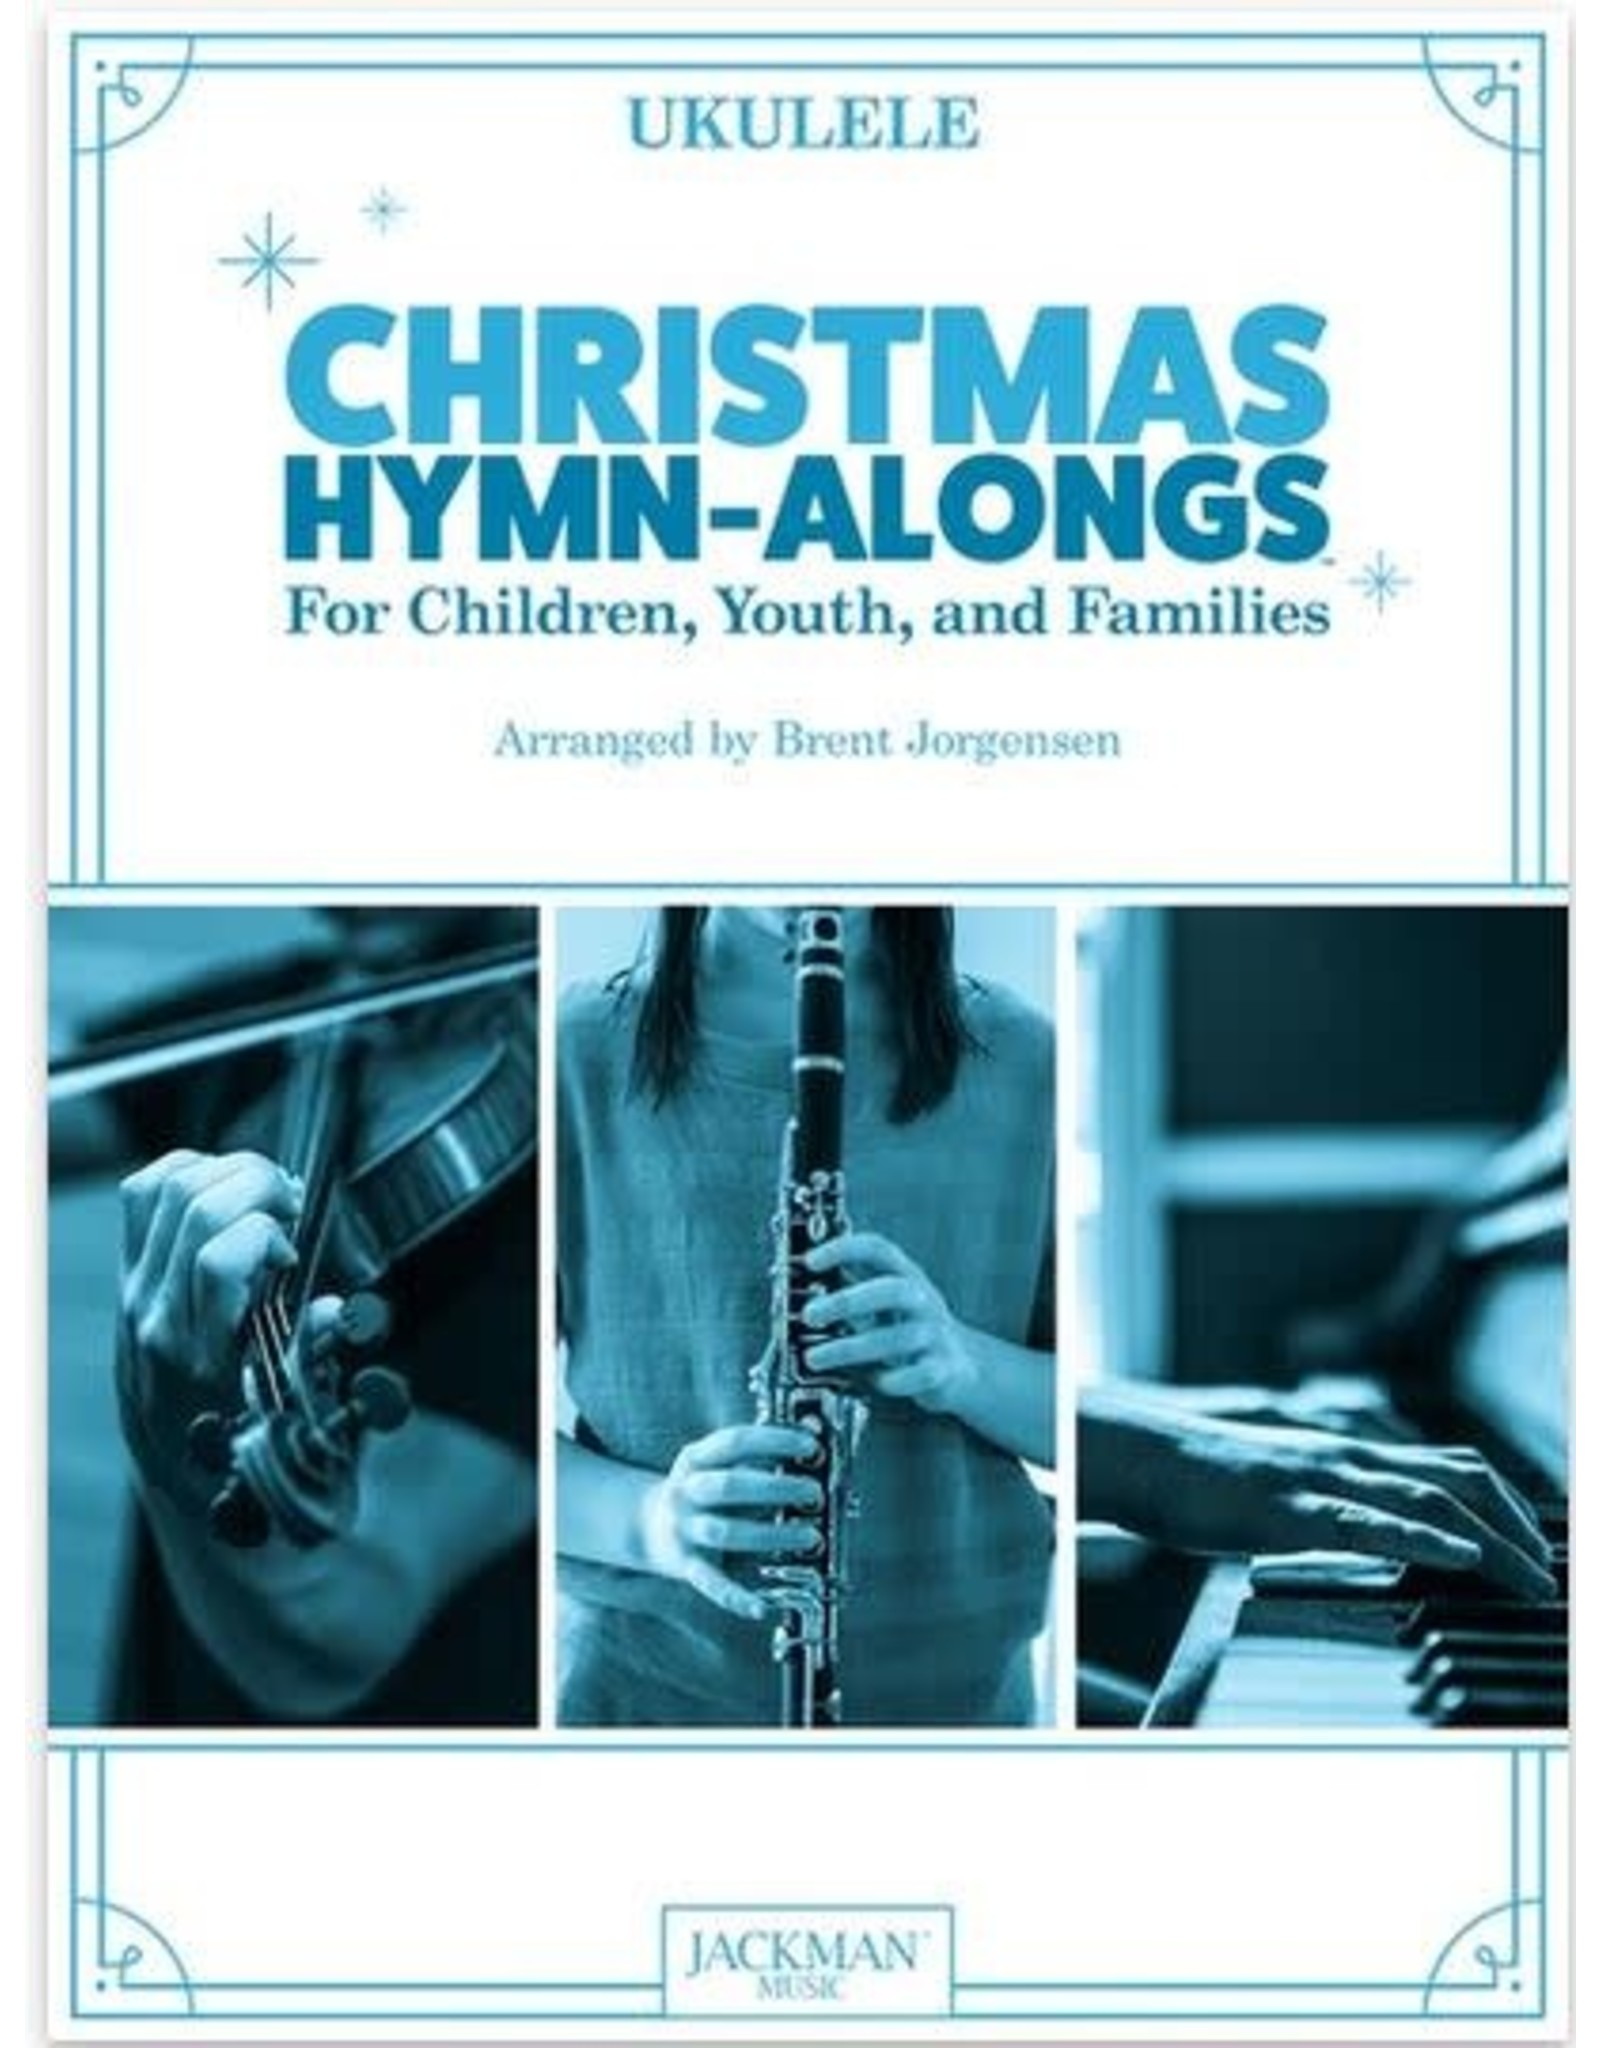 Jackman Music Christmas Hymn-Alongs - arr. Brent Jorgensen - Ukulele